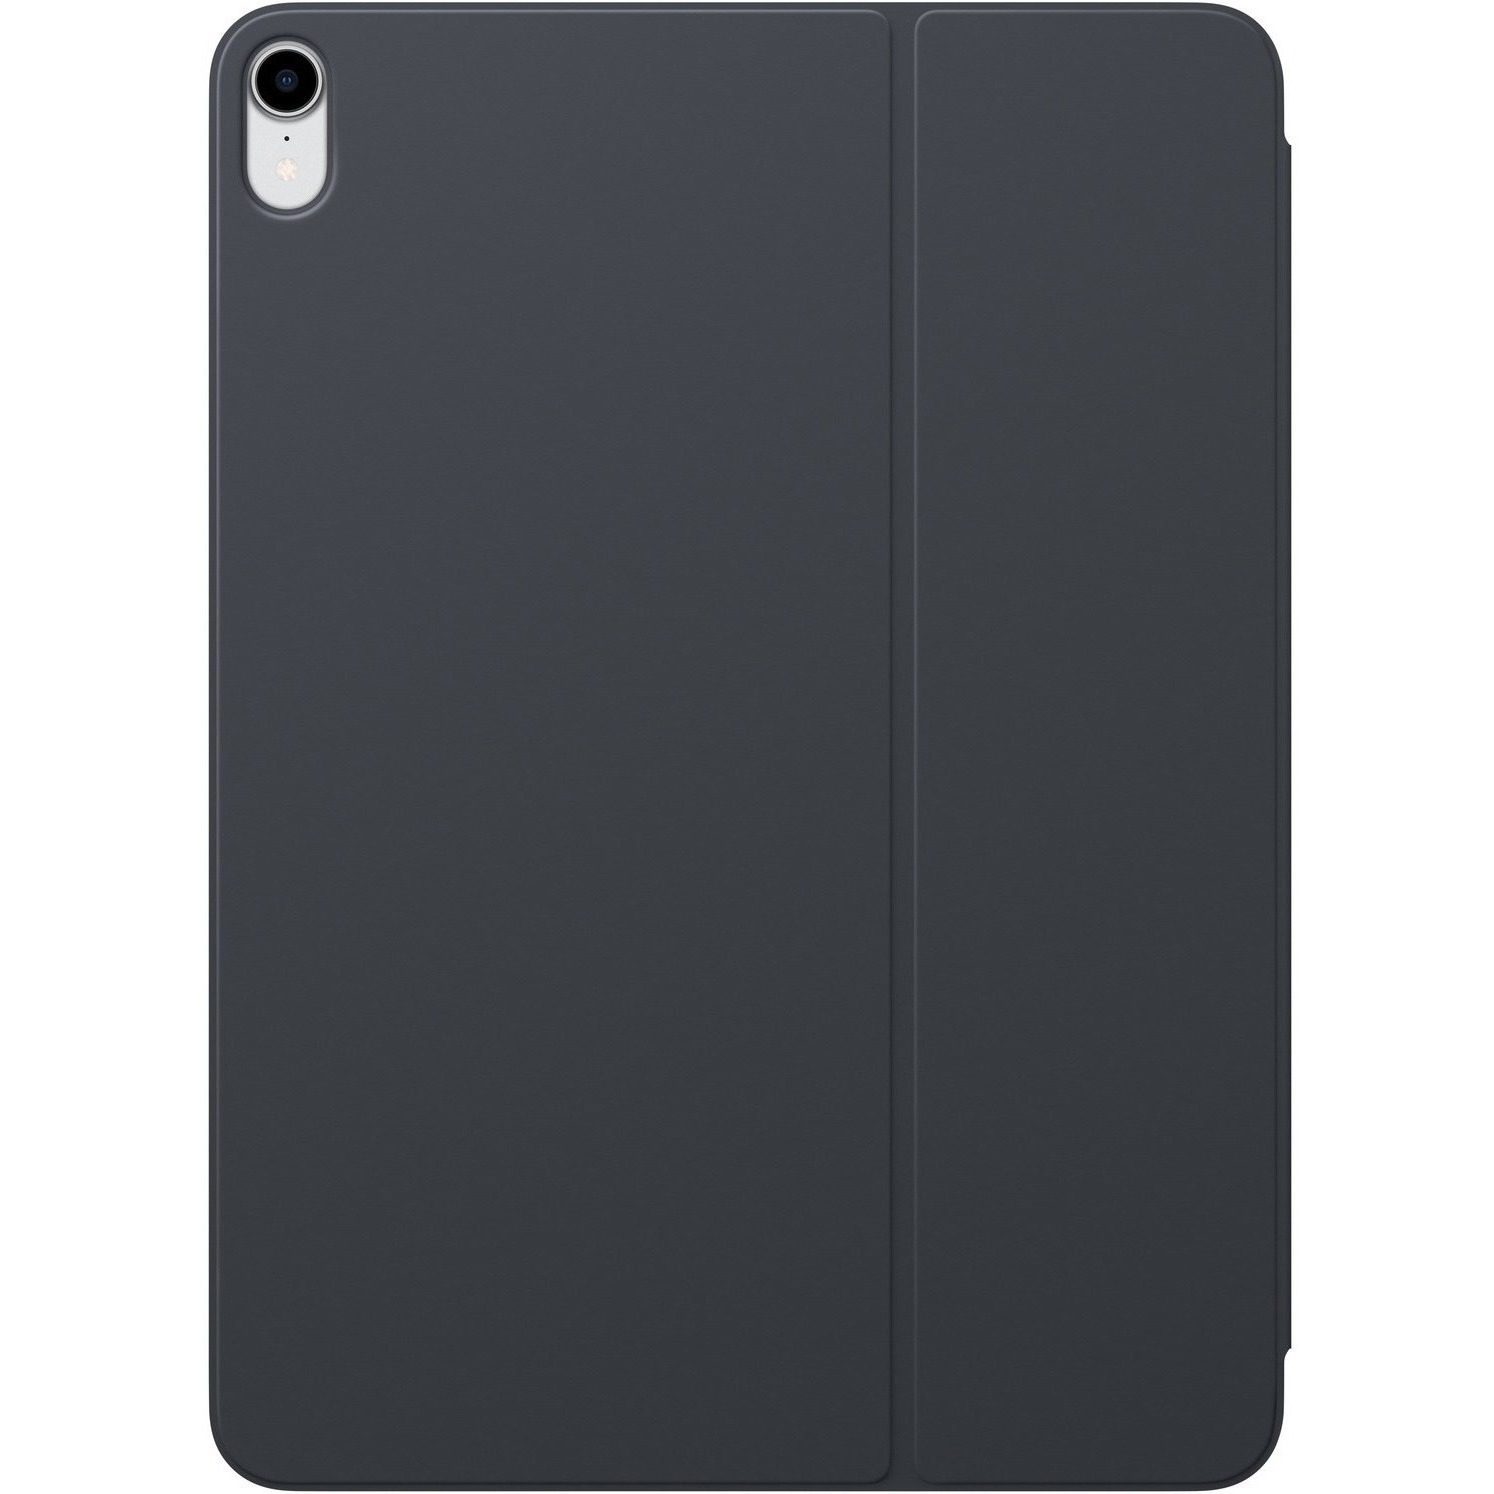 Apple Smart Keyboard Folio Keyboard/Cover Case Folio for Apple 27.9 cm 11And#34; iPad Pro